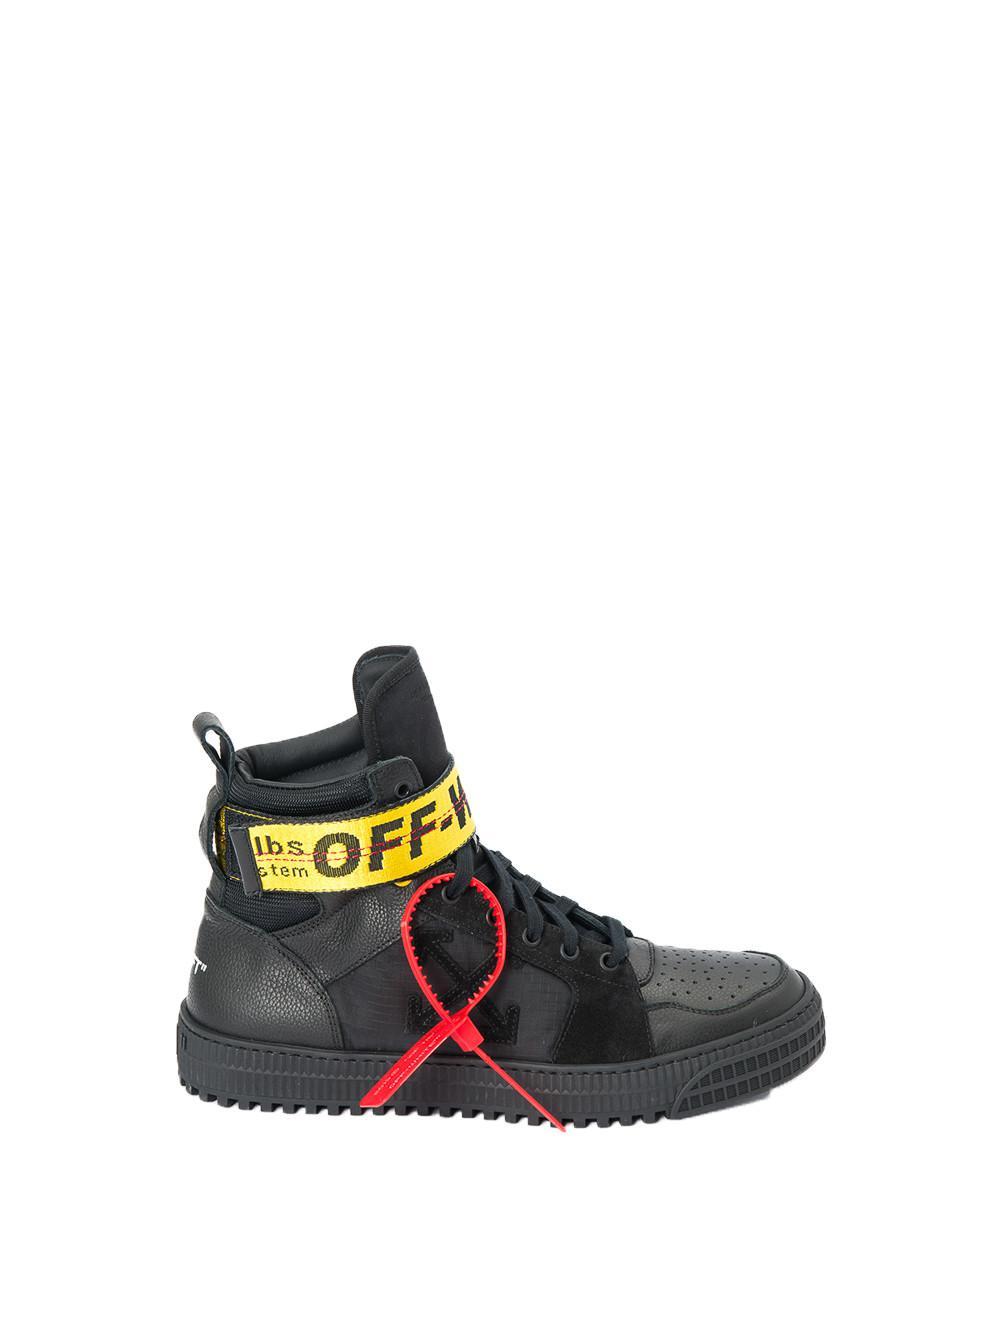 d9d46589e72d2 Off-White C O Virgil Abloh Industrial Sneakers for Men - Lyst